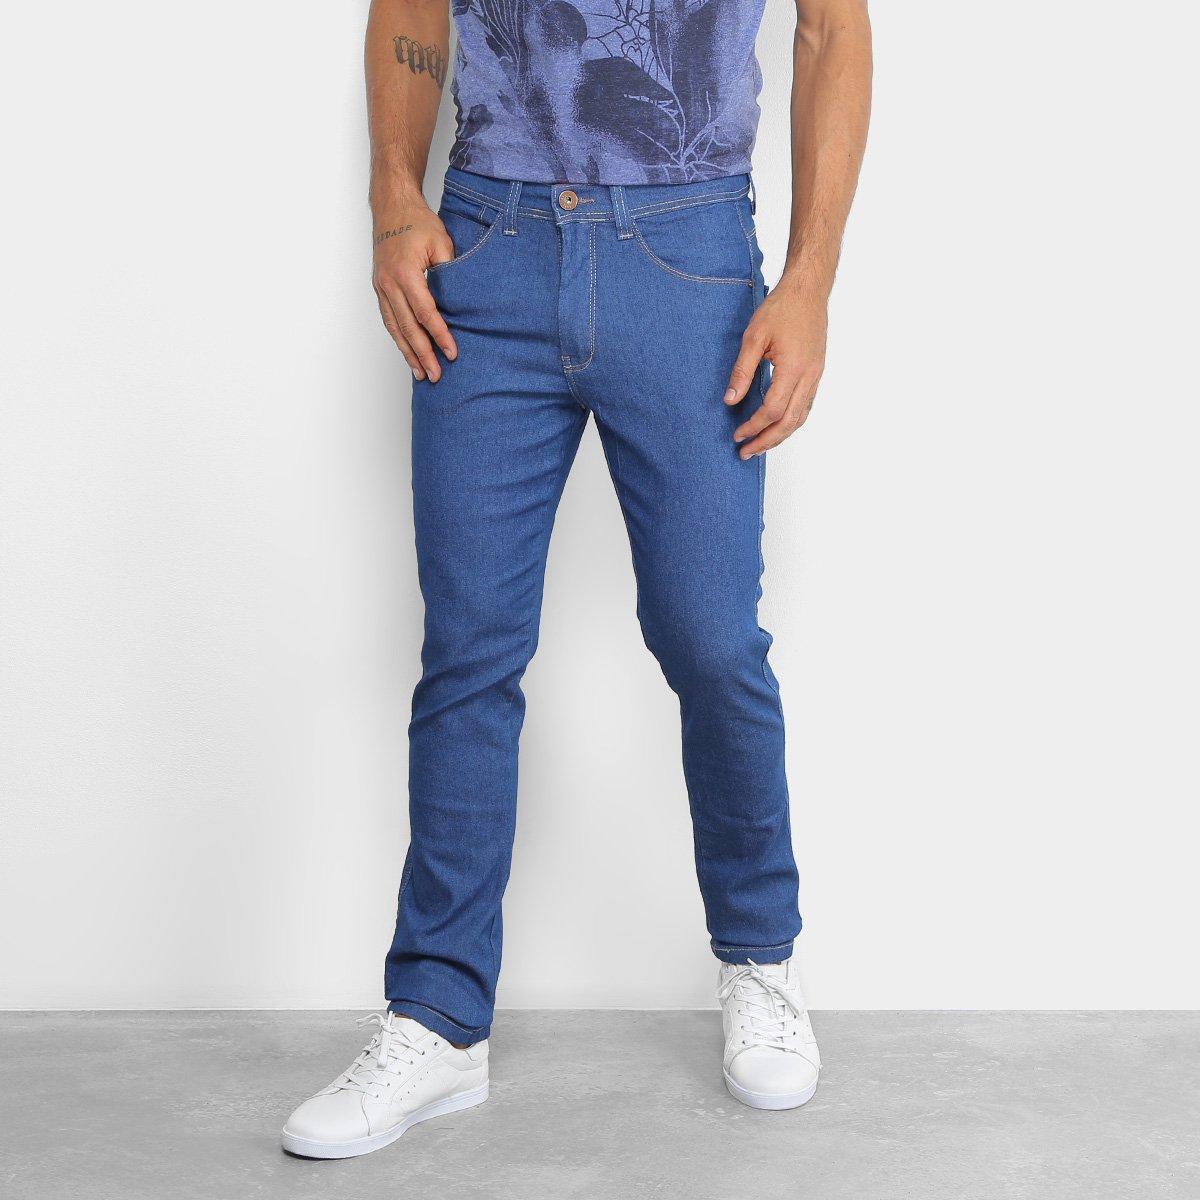 32e05400f Calça Jeans Skinny Fatal Clássica Masculina